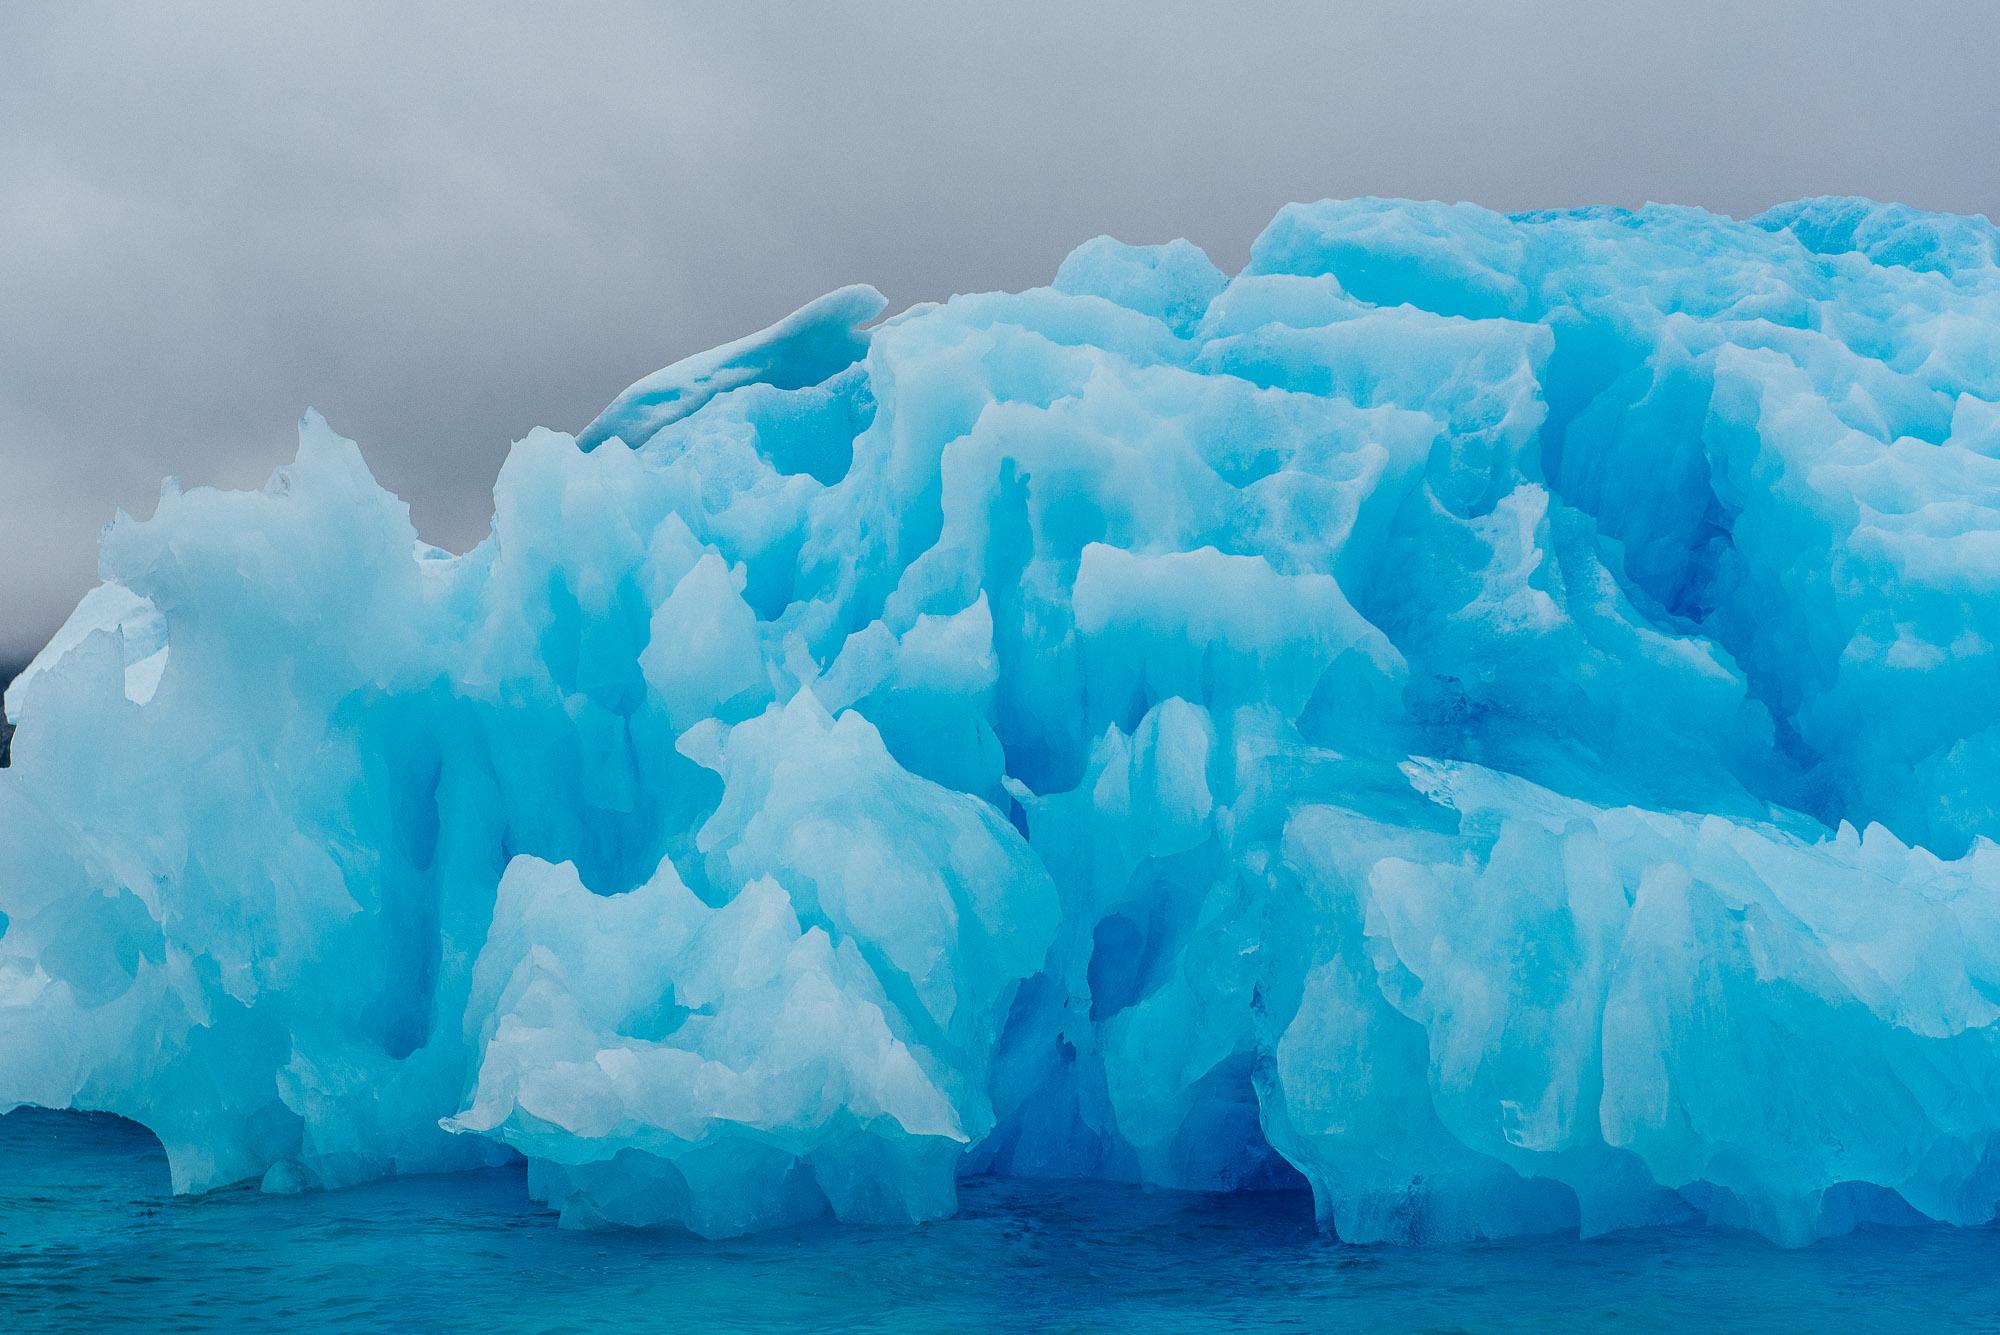 Qooroq glacier